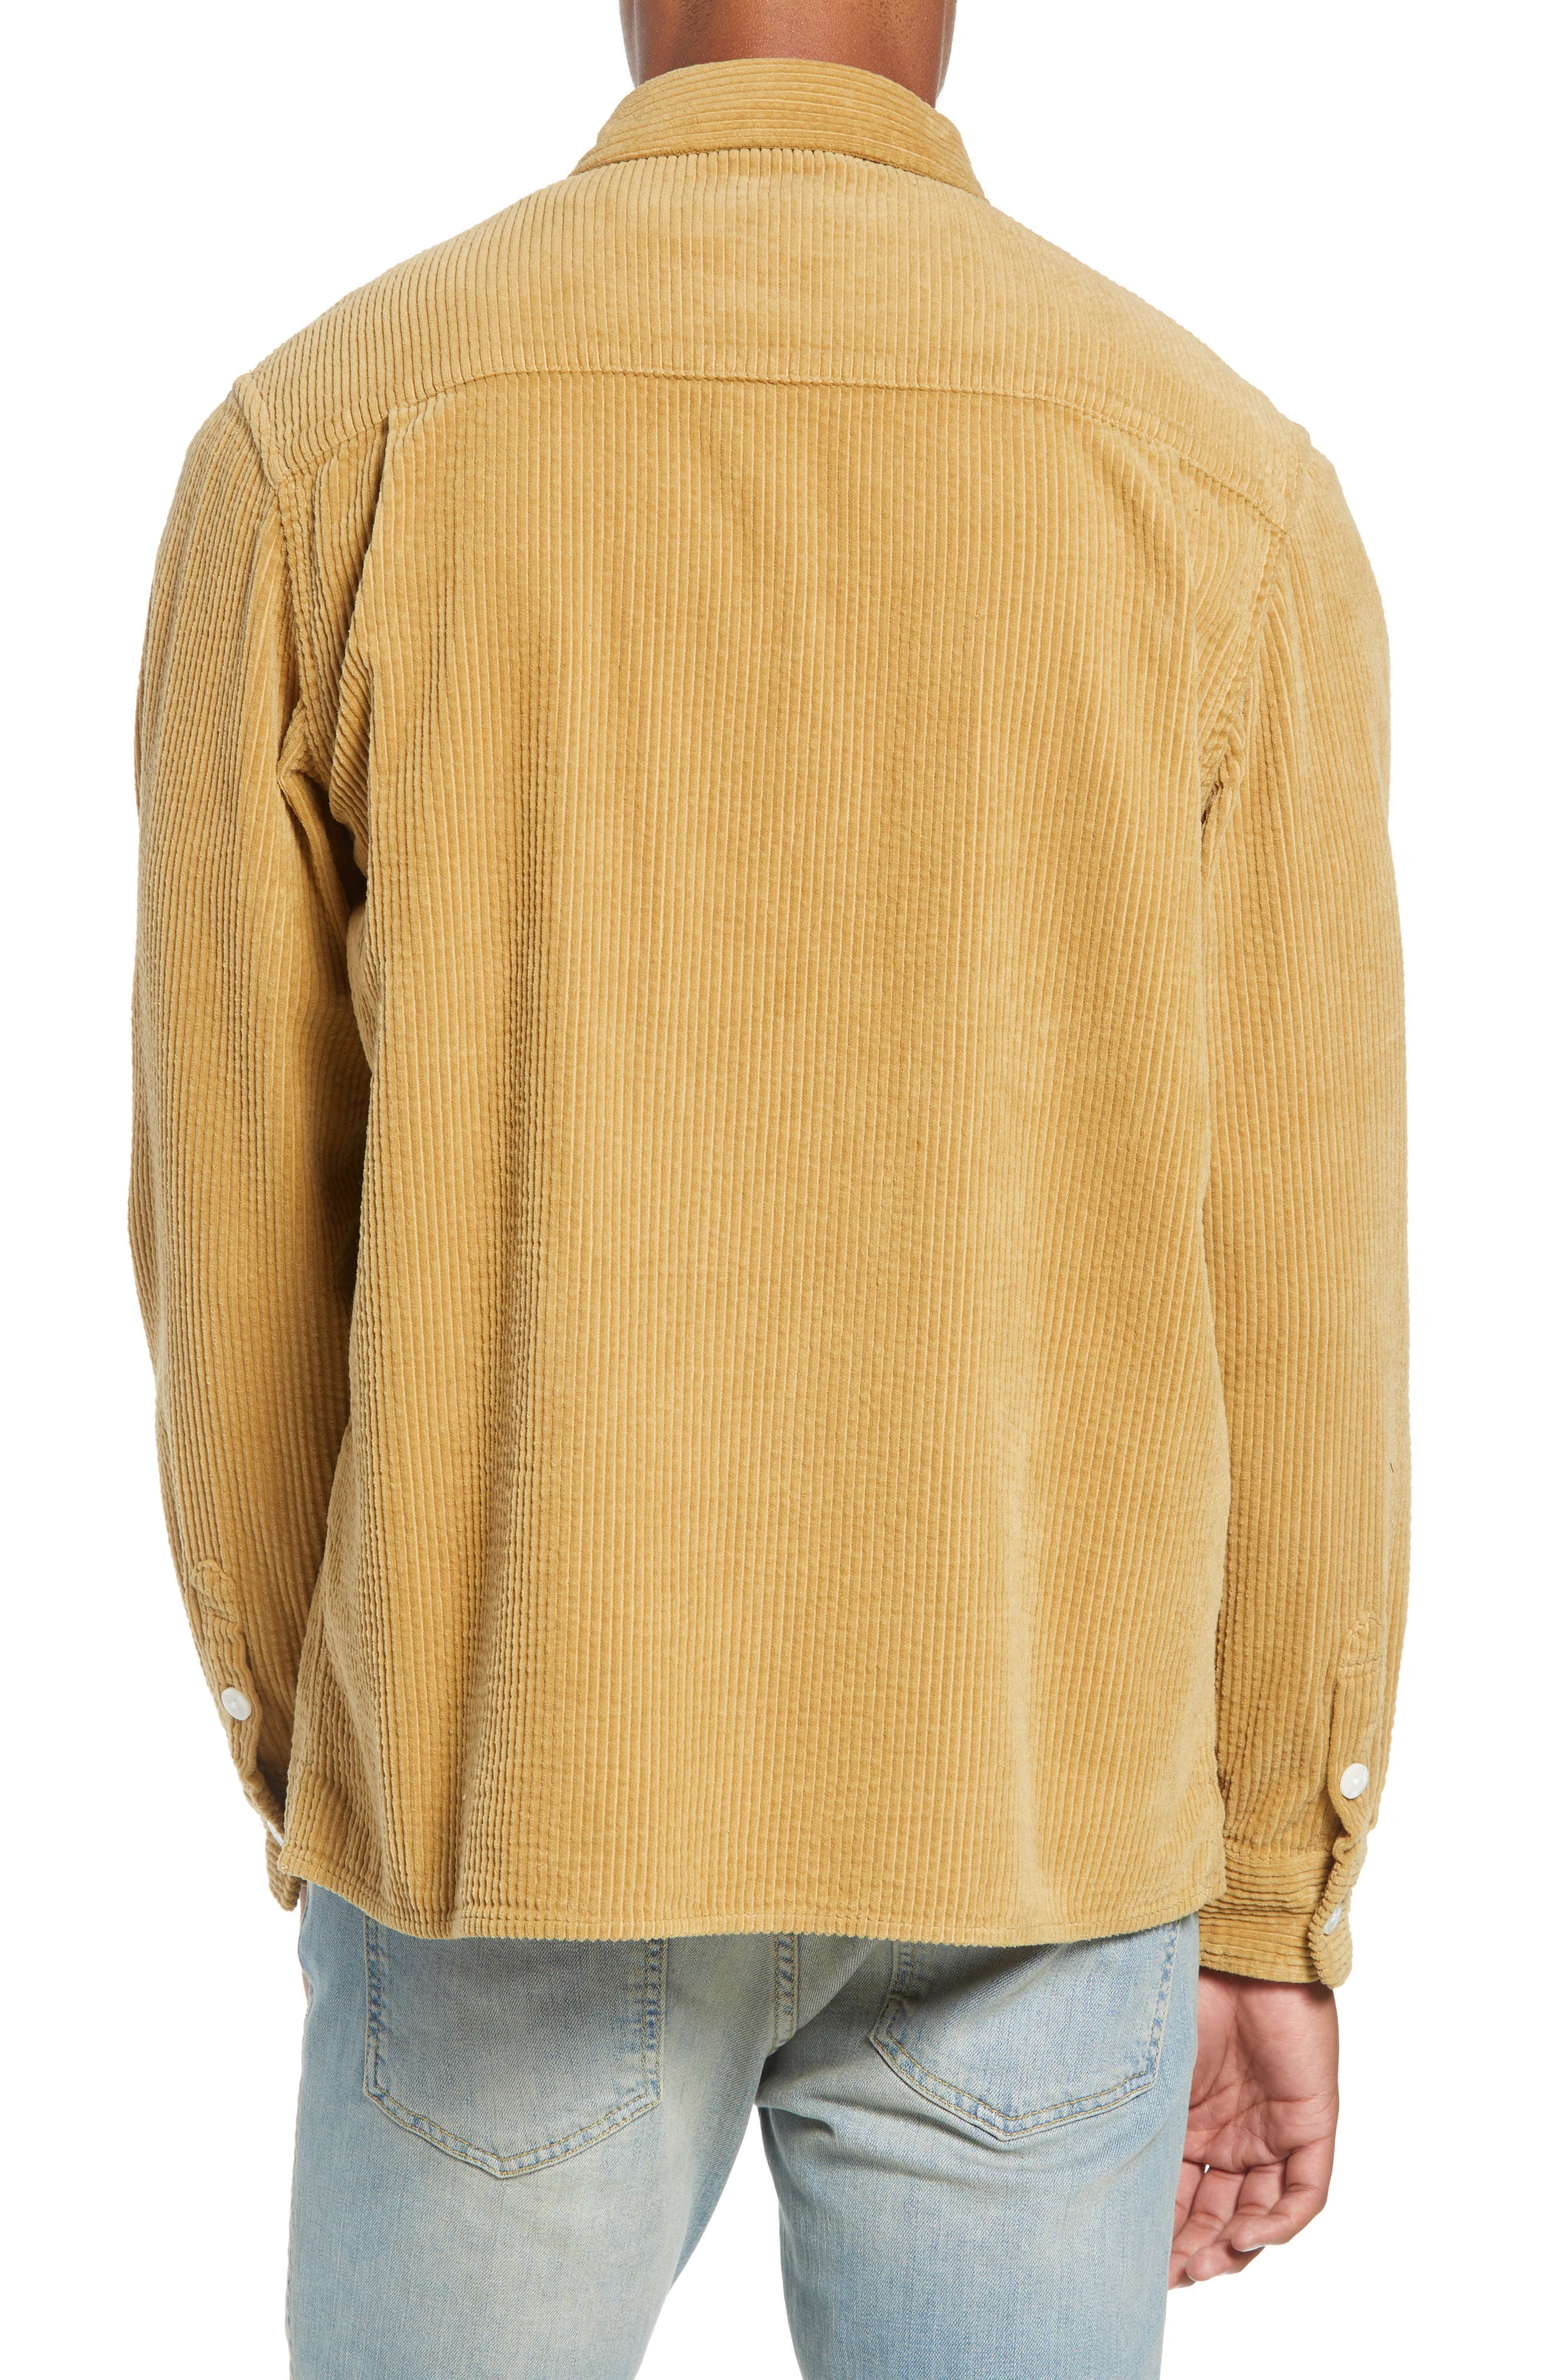 Magnus Heavy Corduroy Shirt,                             Alternate thumbnail 3, color,                             BRITISH KHAKI